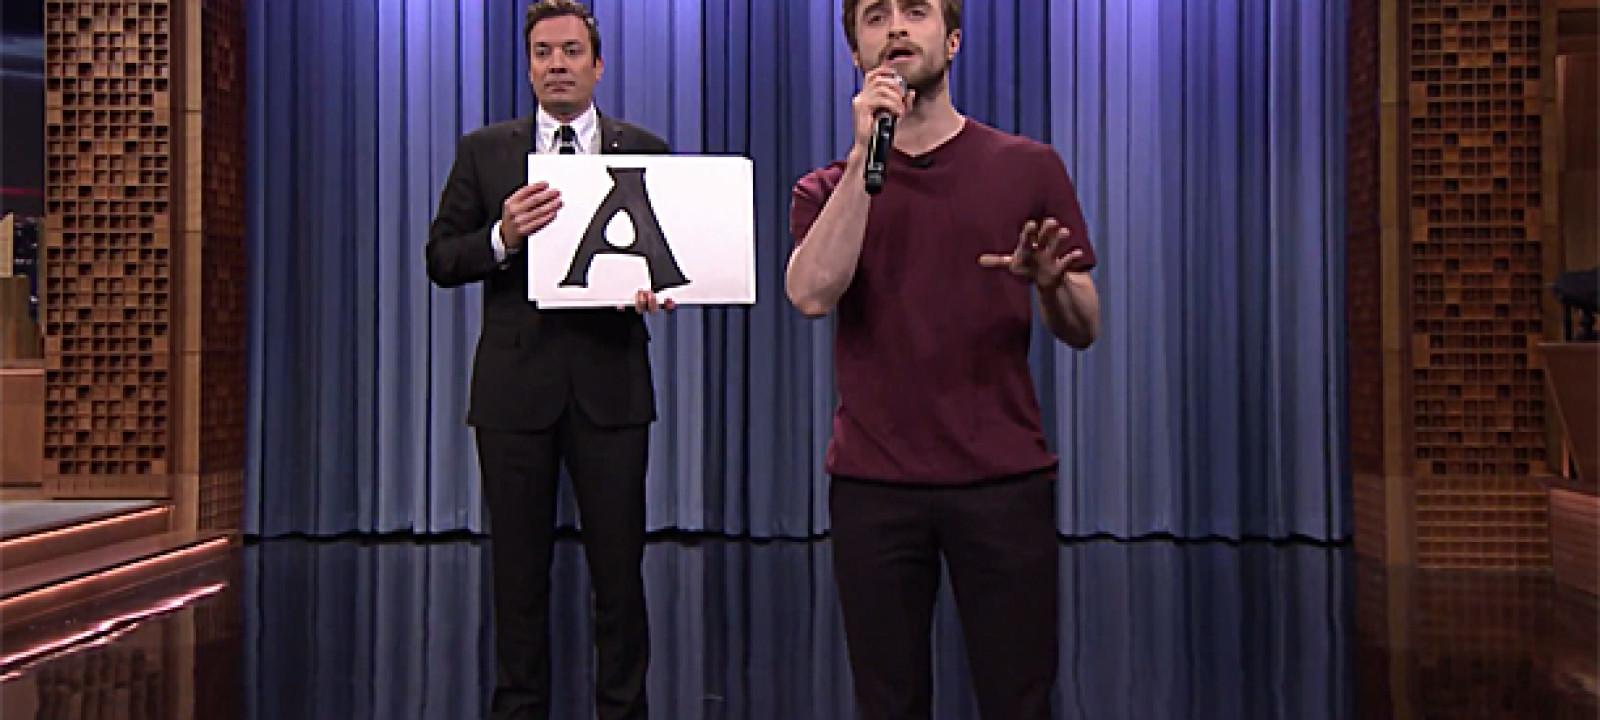 Daniel Radcliffe and Jimmy Fallon (Pic: NBC)